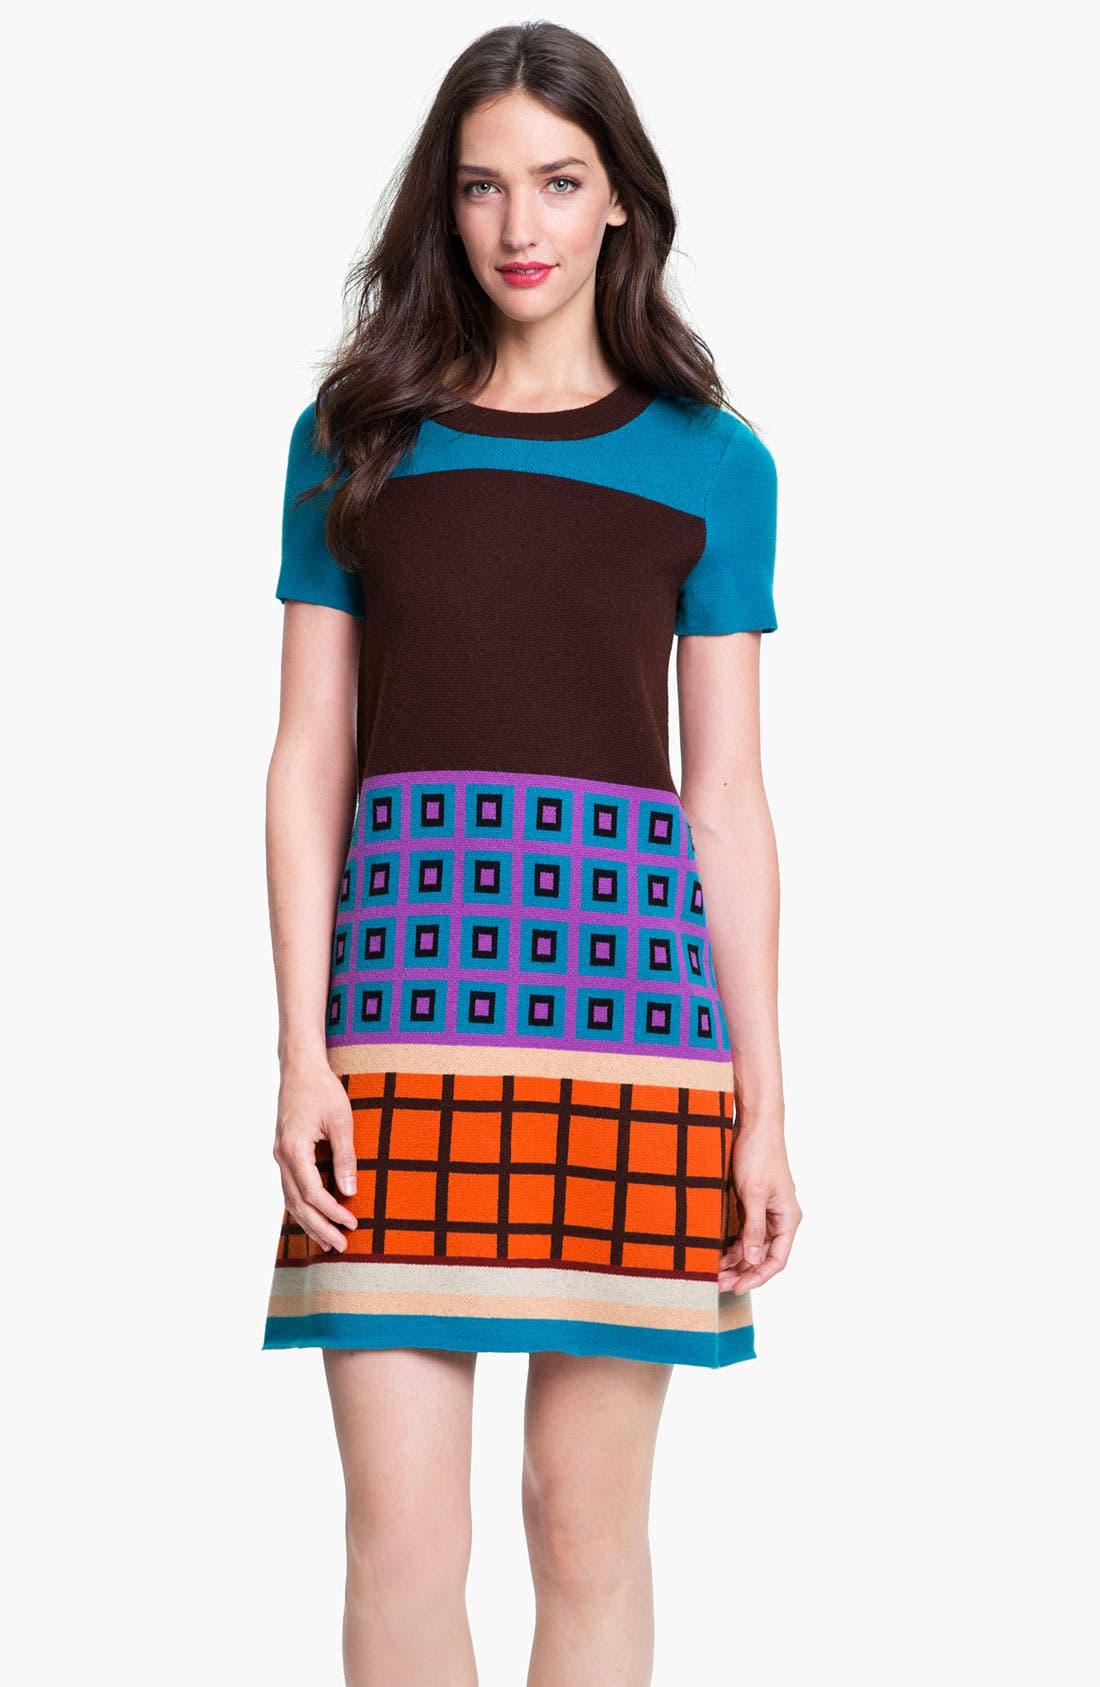 Main Image - kate spade new york 'freyda' wool blend sweater shift dress